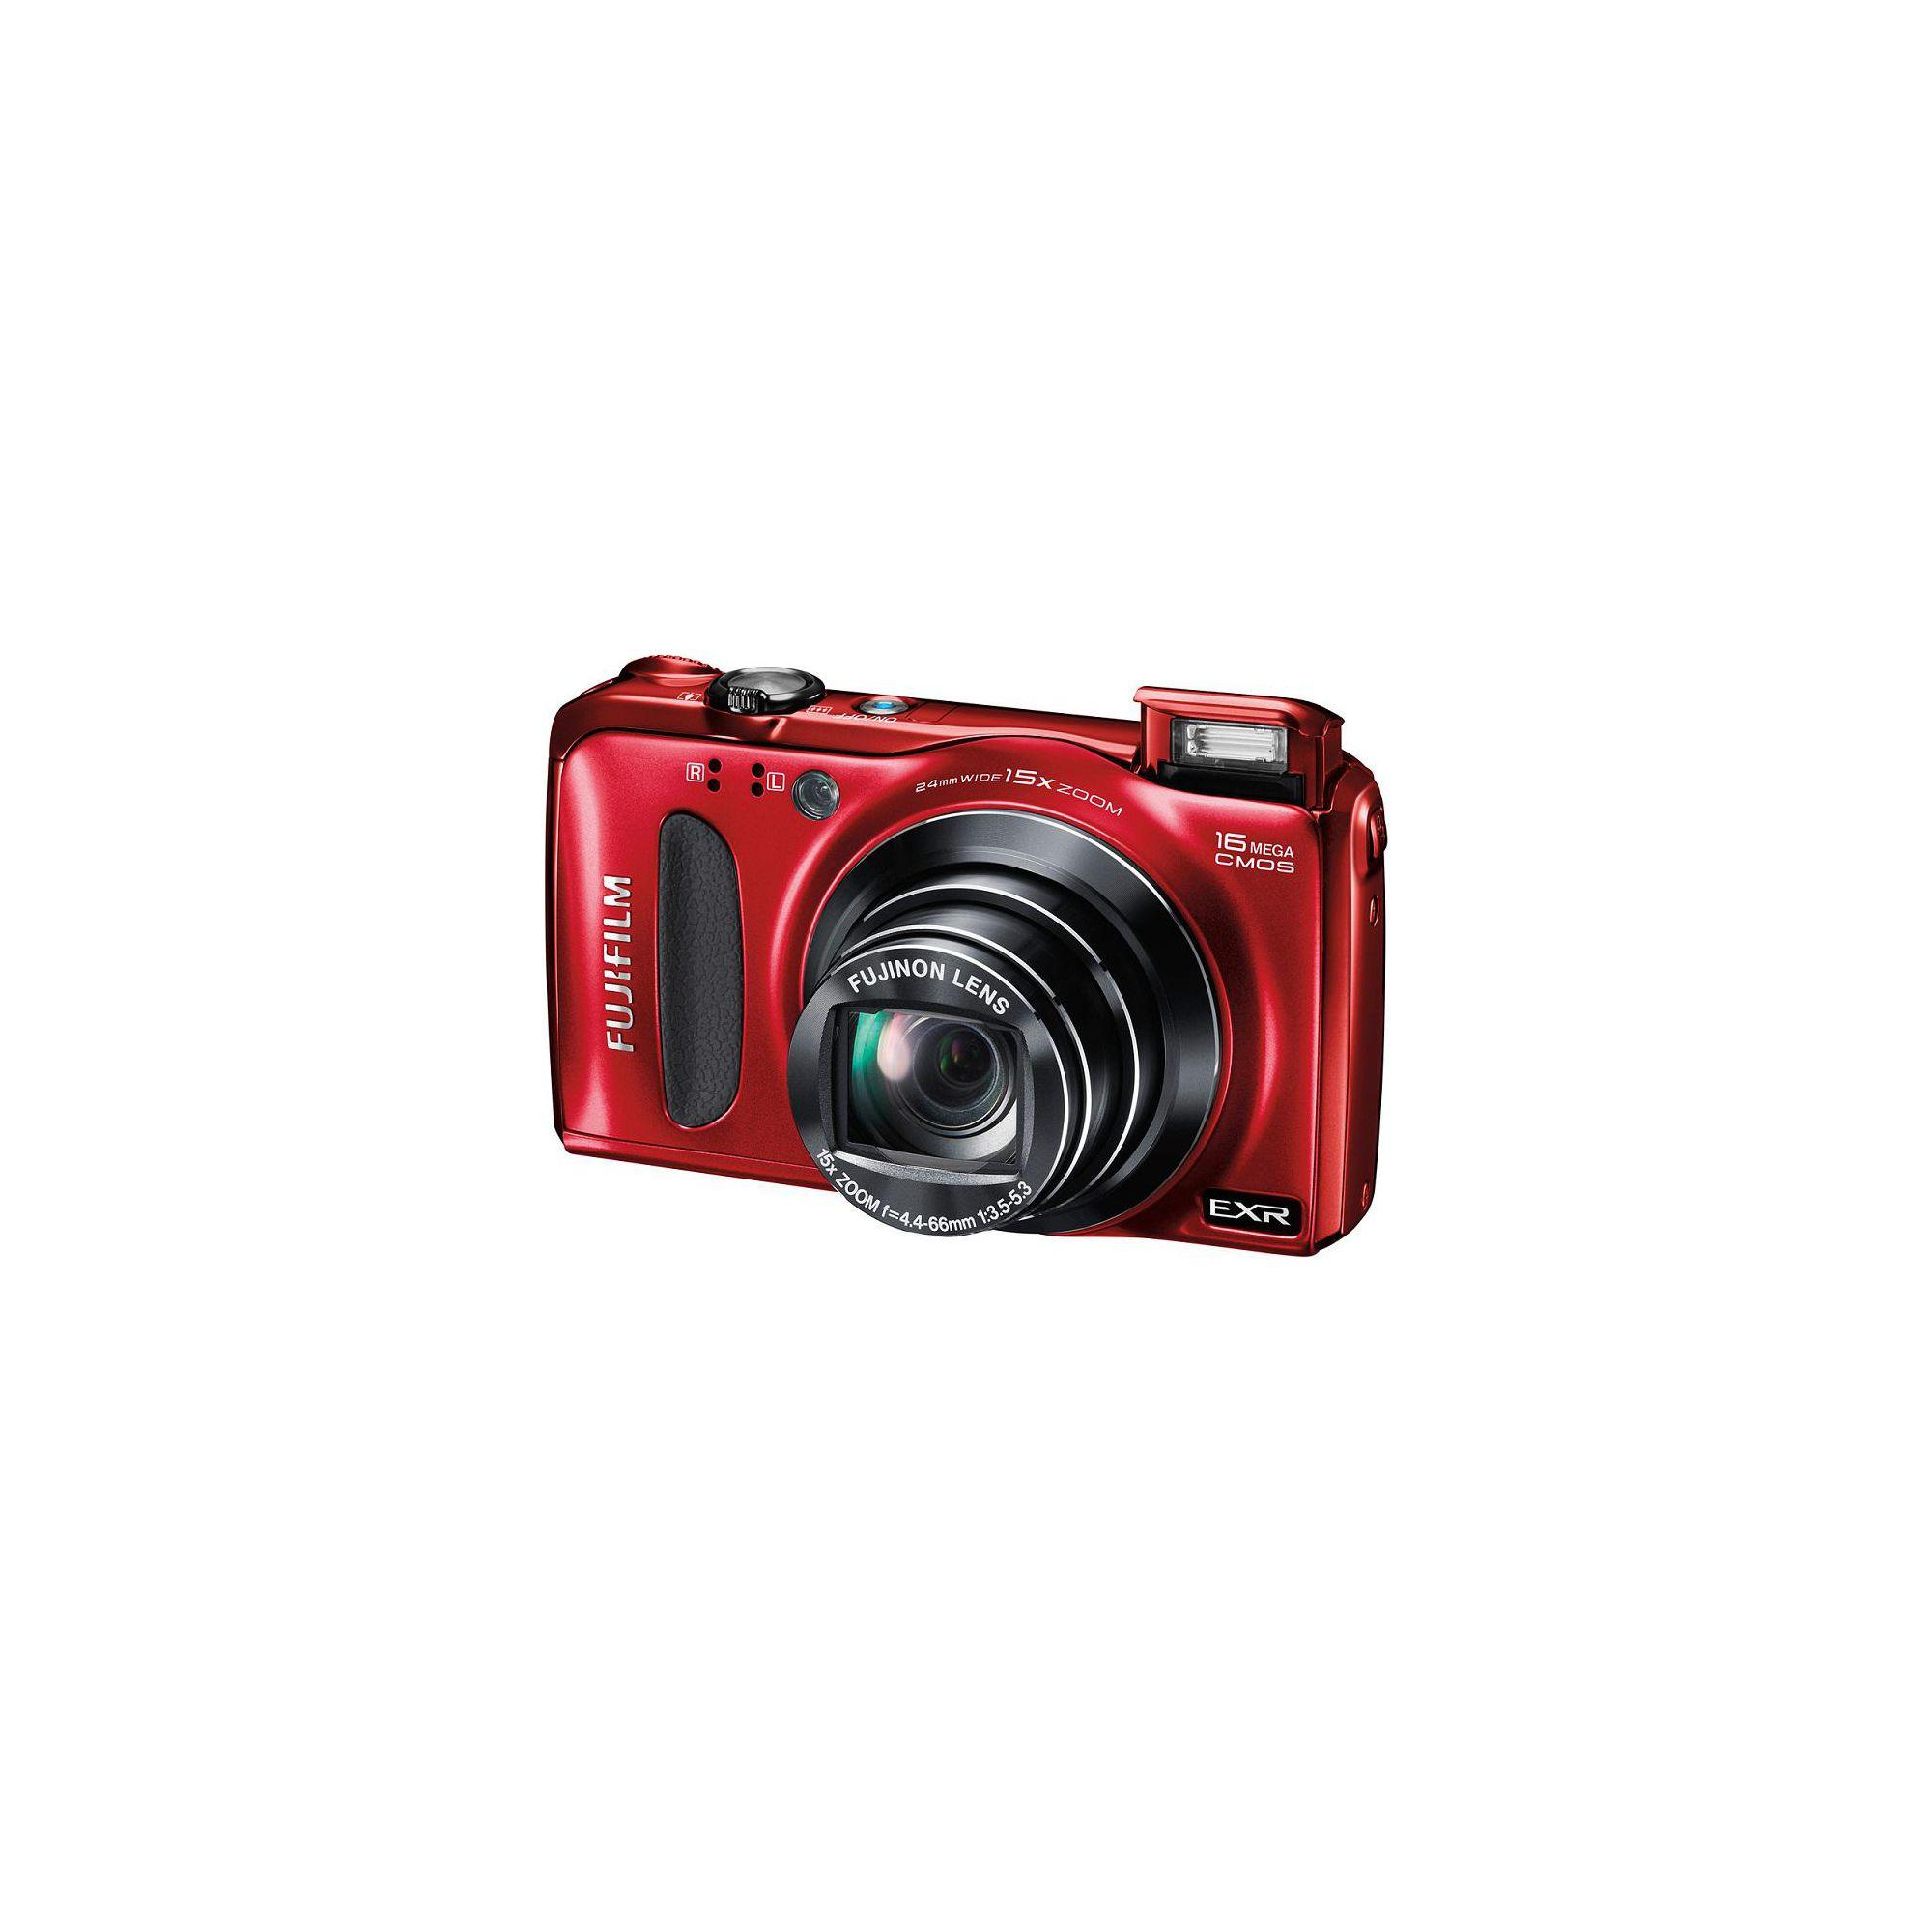 Fujifilm F660 Digital Camera, Red, 16MP, 15x Optical Zoom, 3.0 inch LCD Screen